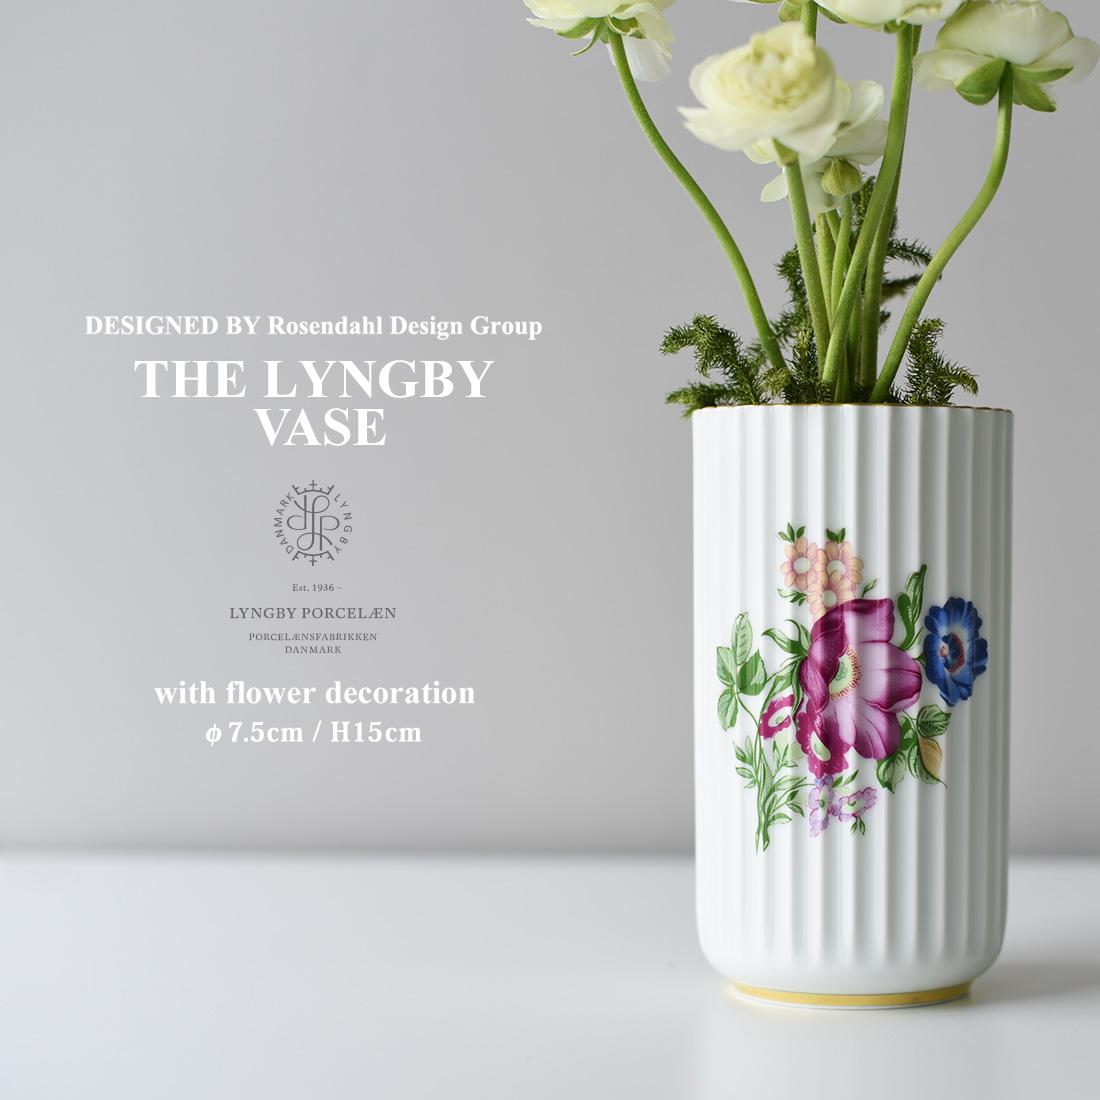 【Lyngby Porcelaen/リュンビュー ポーセリン】リュンビューベース フラワー近代アート シンプル ローゼンダール デンマーク 花器 陶器 花瓶 北欧 コンビニ受取対応